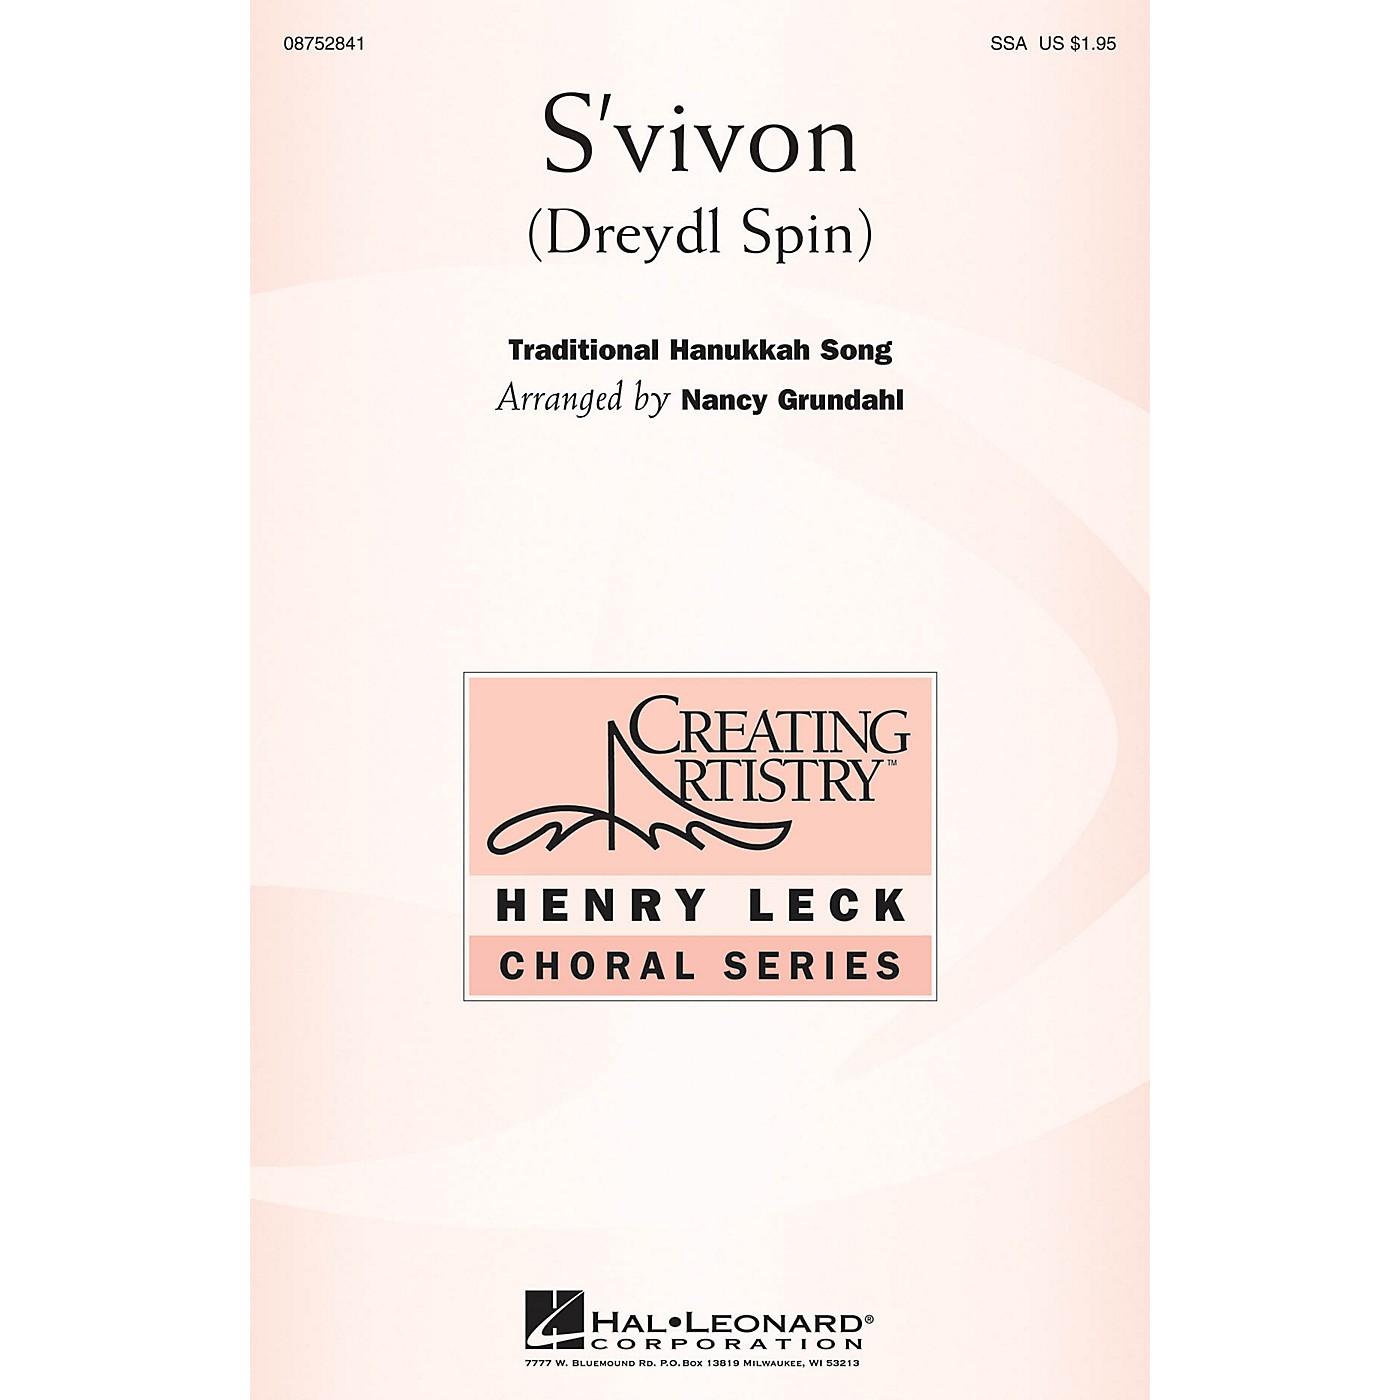 Hal Leonard S'vivon (Dreidel Spin) (Dreydl Spin) SSA arranged by Nancy Grundahl thumbnail